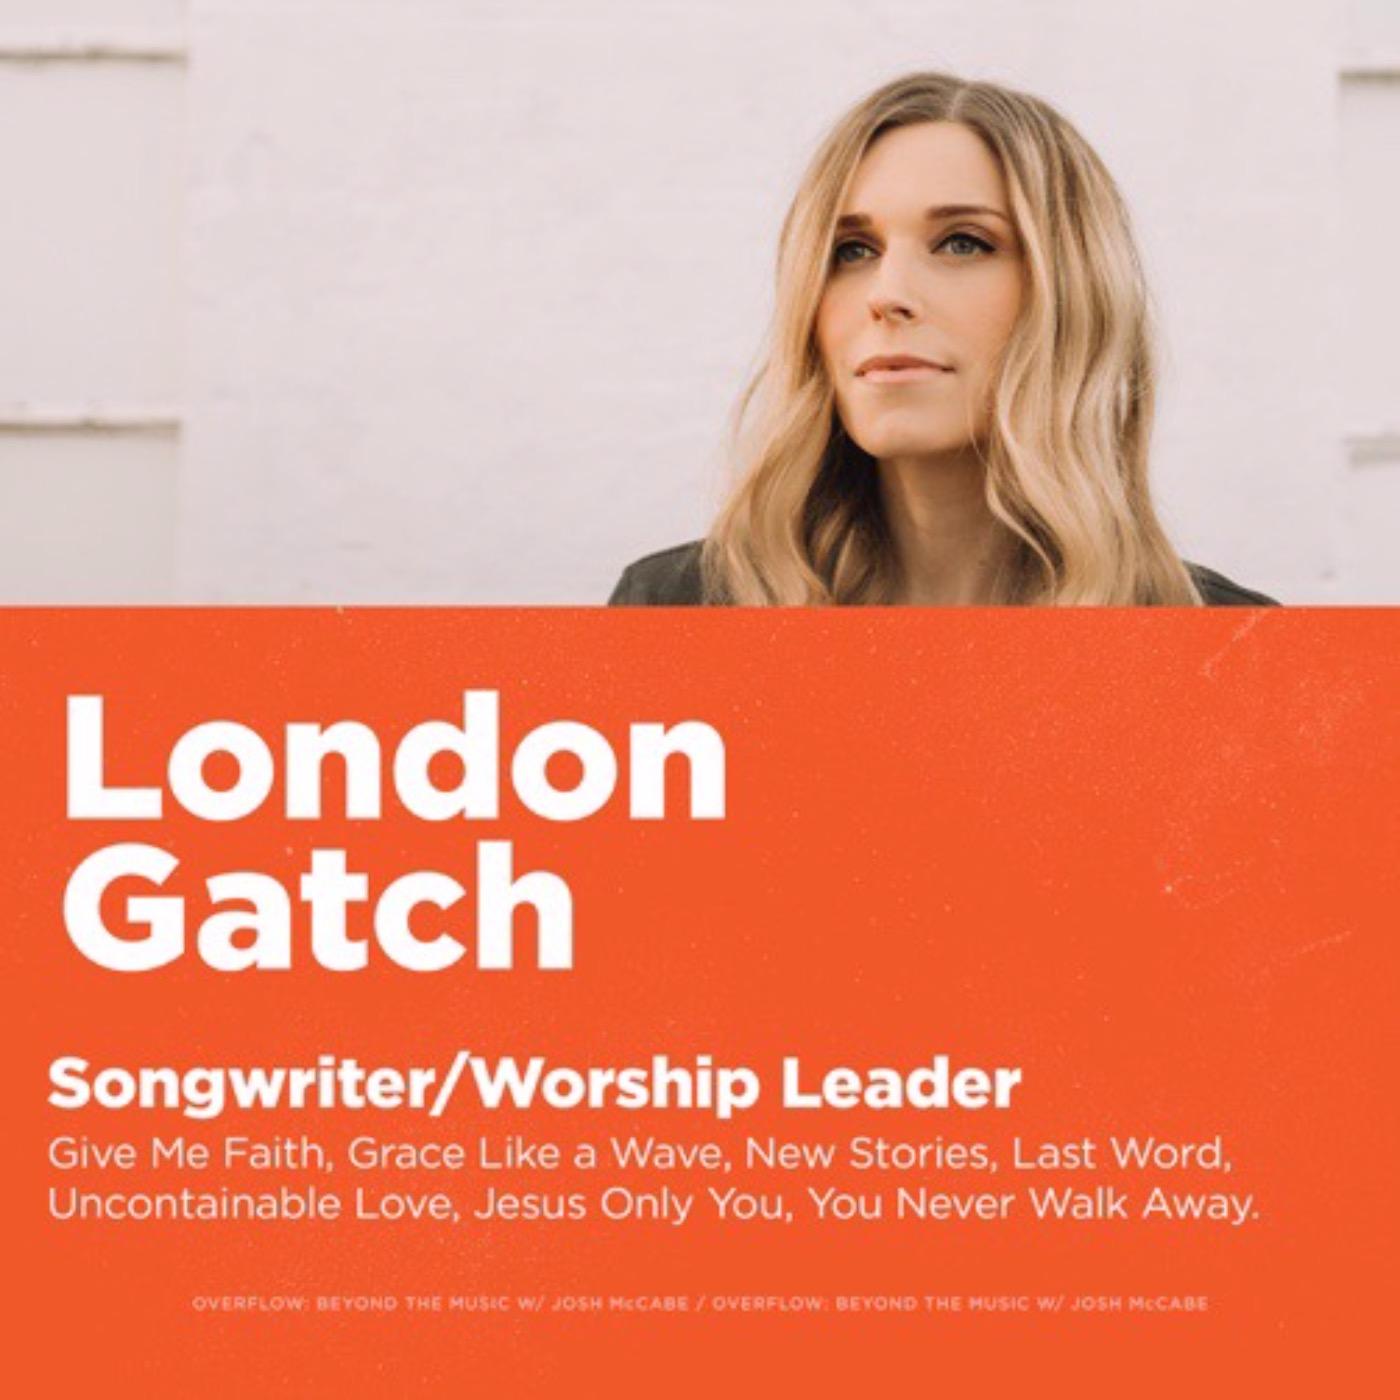 London Gatch: New Stories